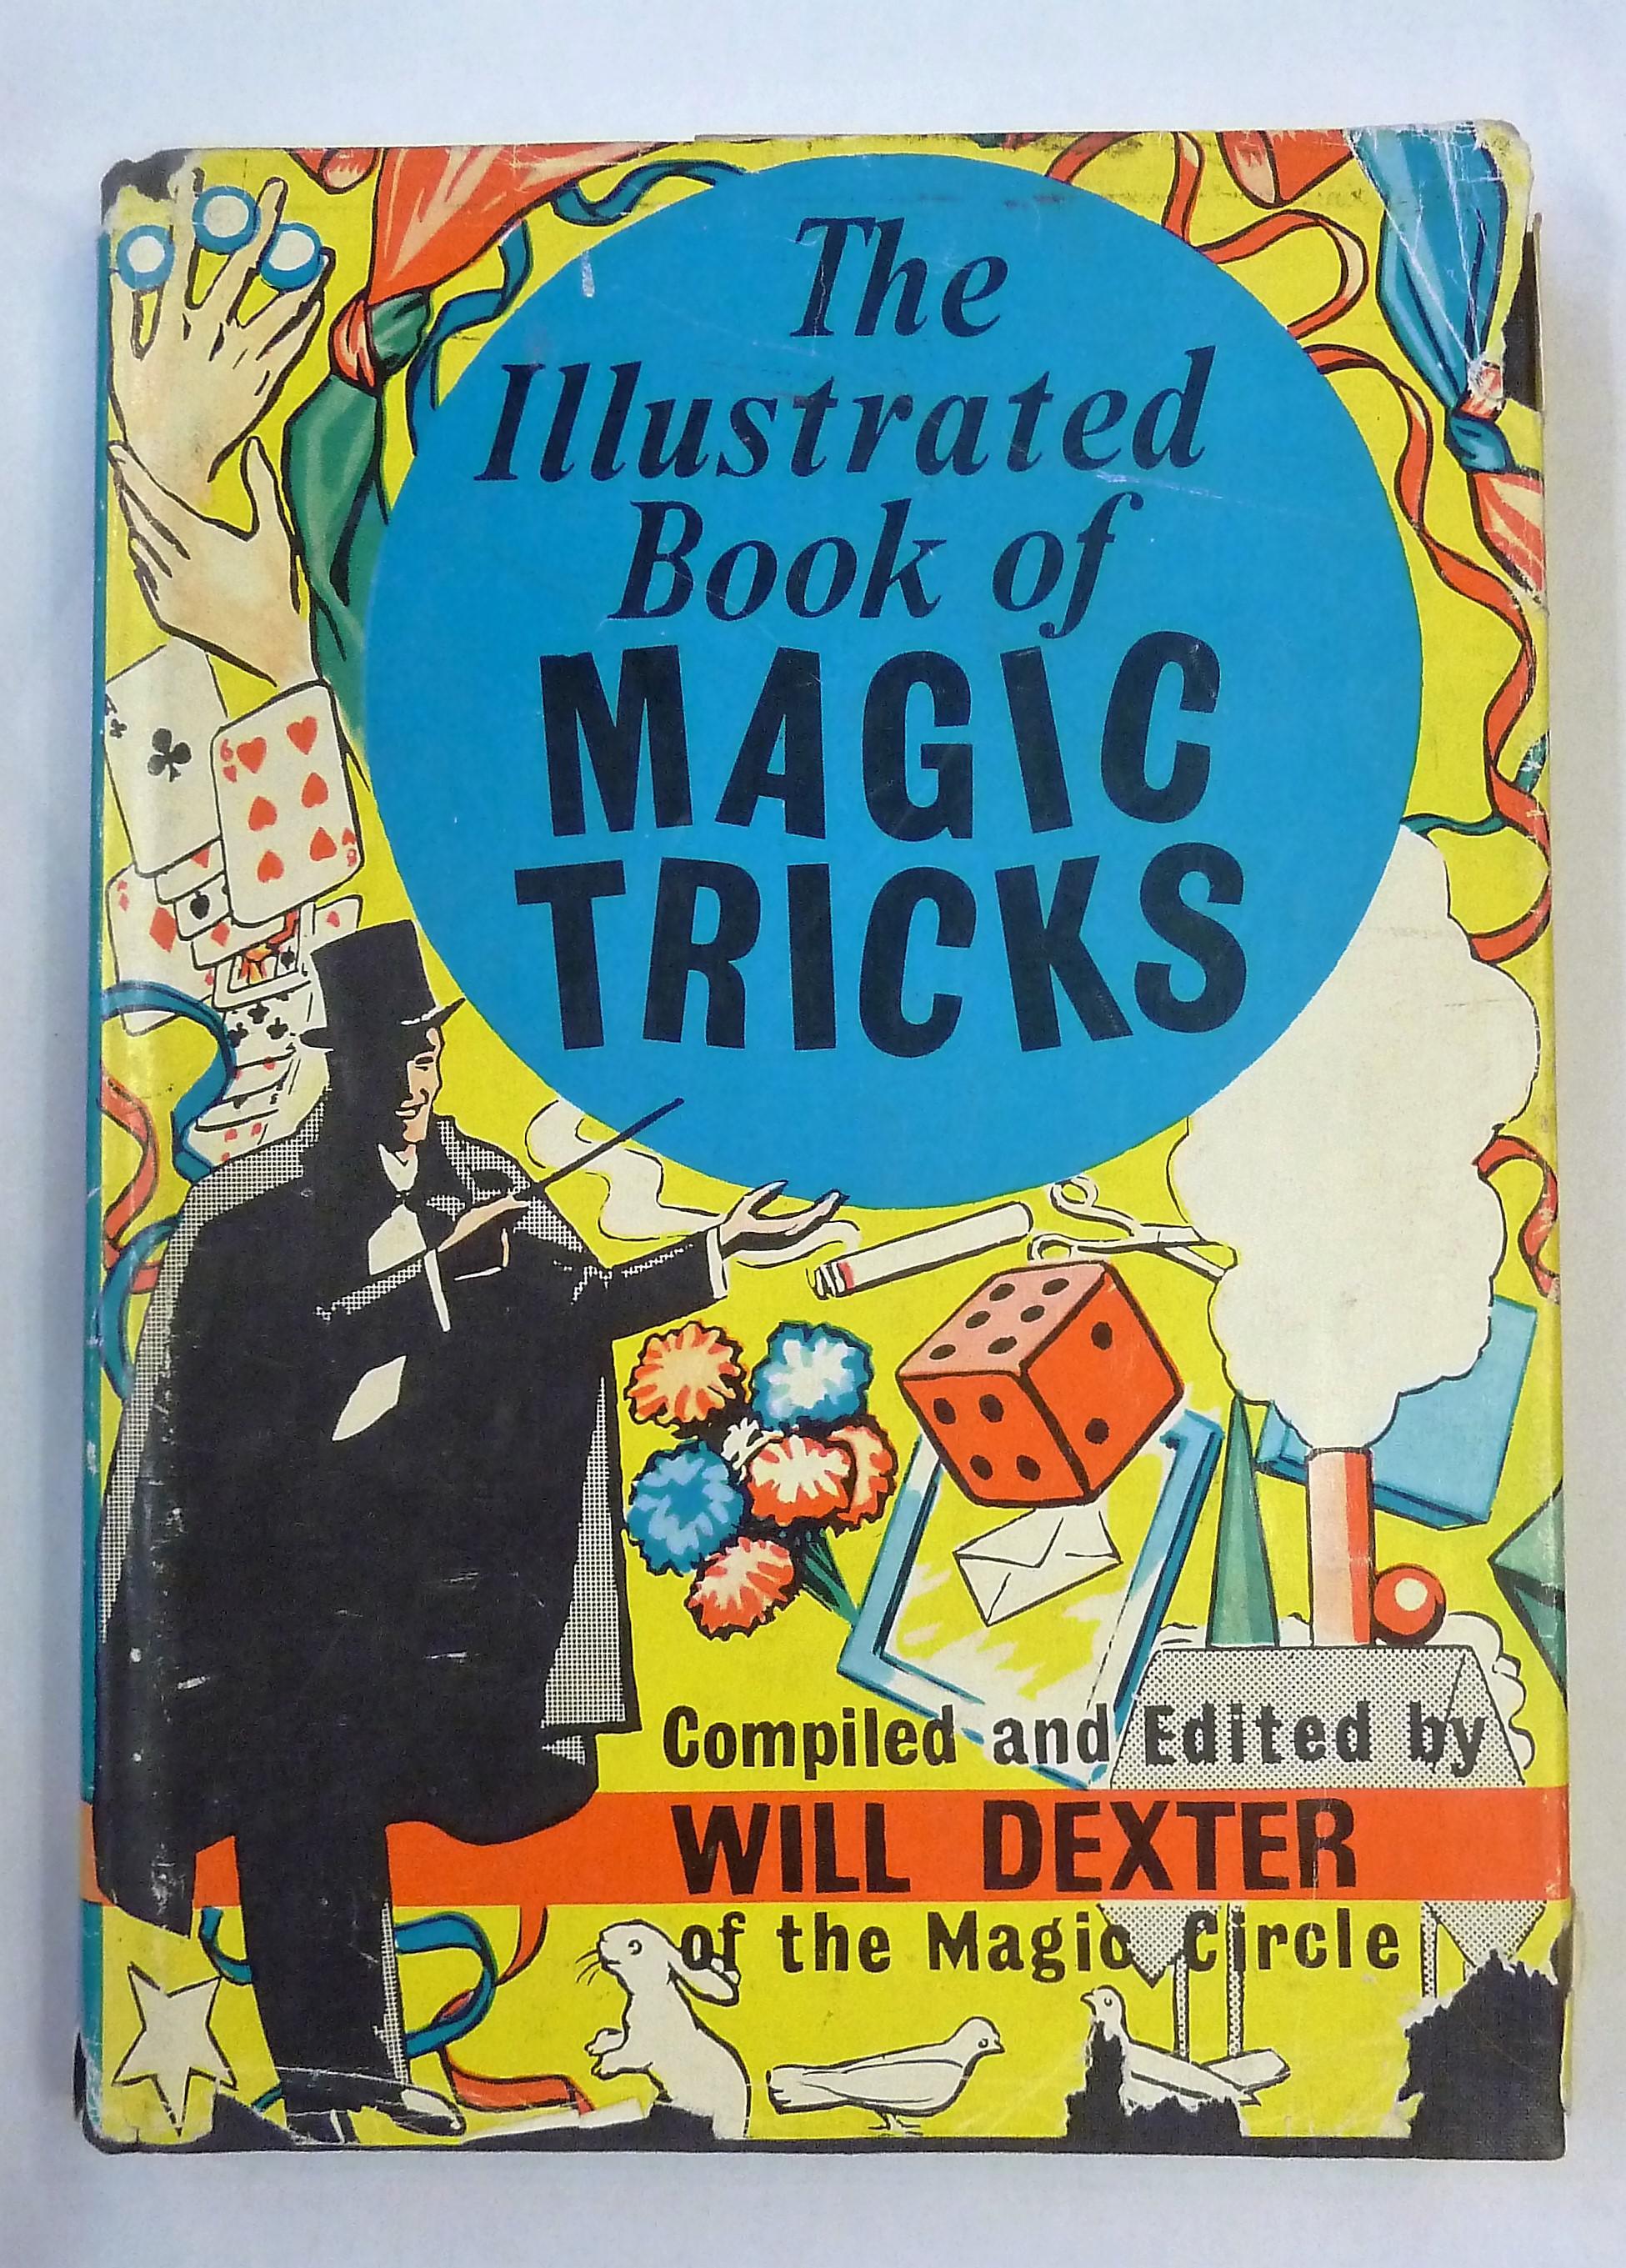 The Illustrated Book of Magic Tricks